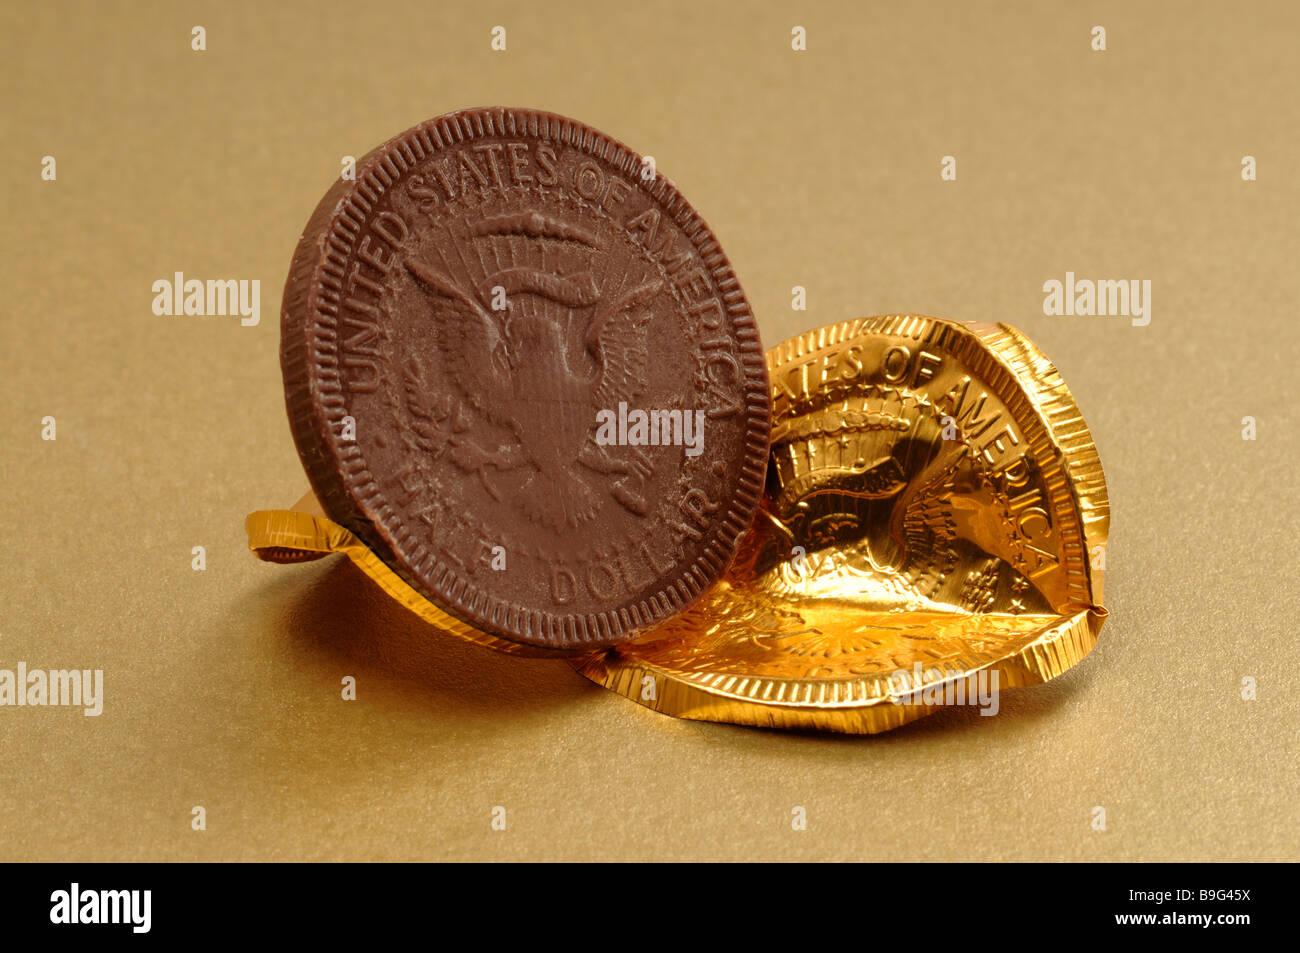 Chocolate United States Half Dollar coin - Stock Image